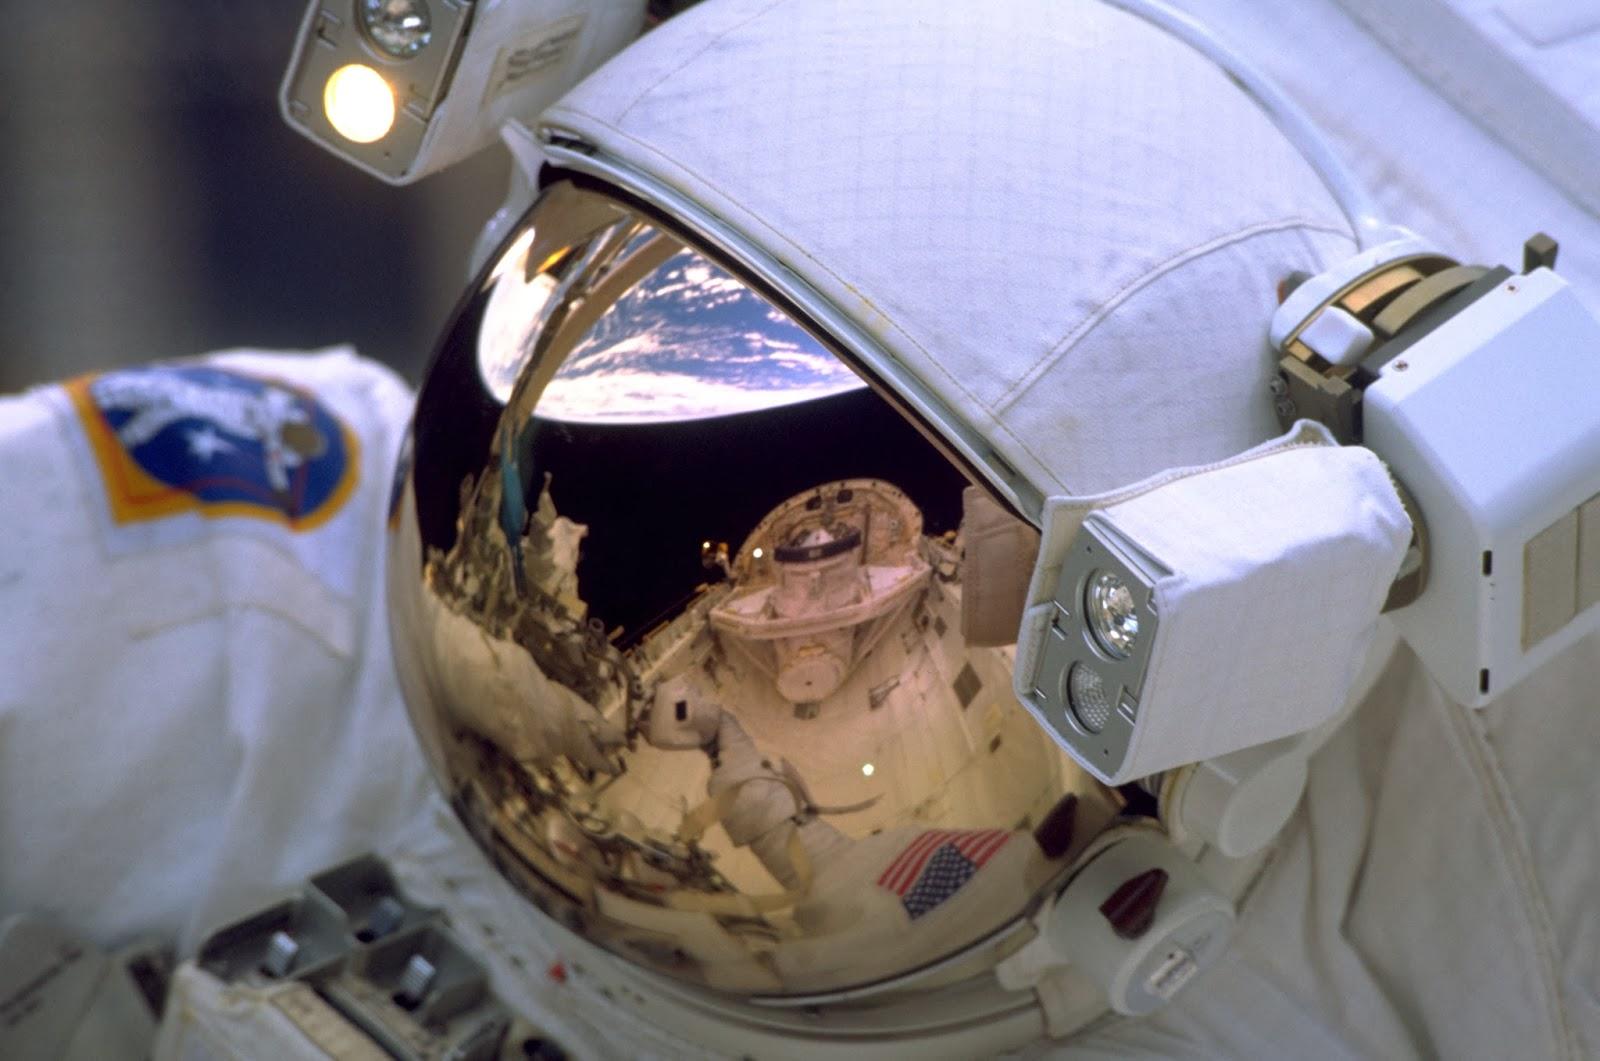 ancient astronaut on the moon - photo #9